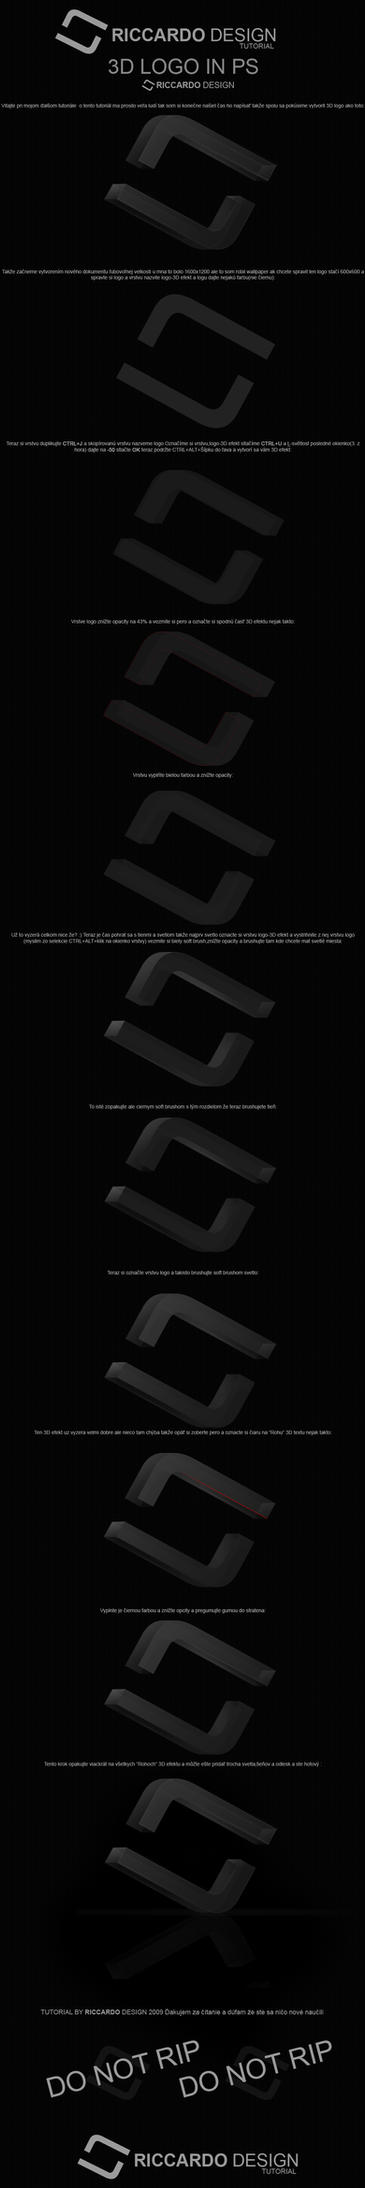 3D logo TUTORIAL by Riccardo2503